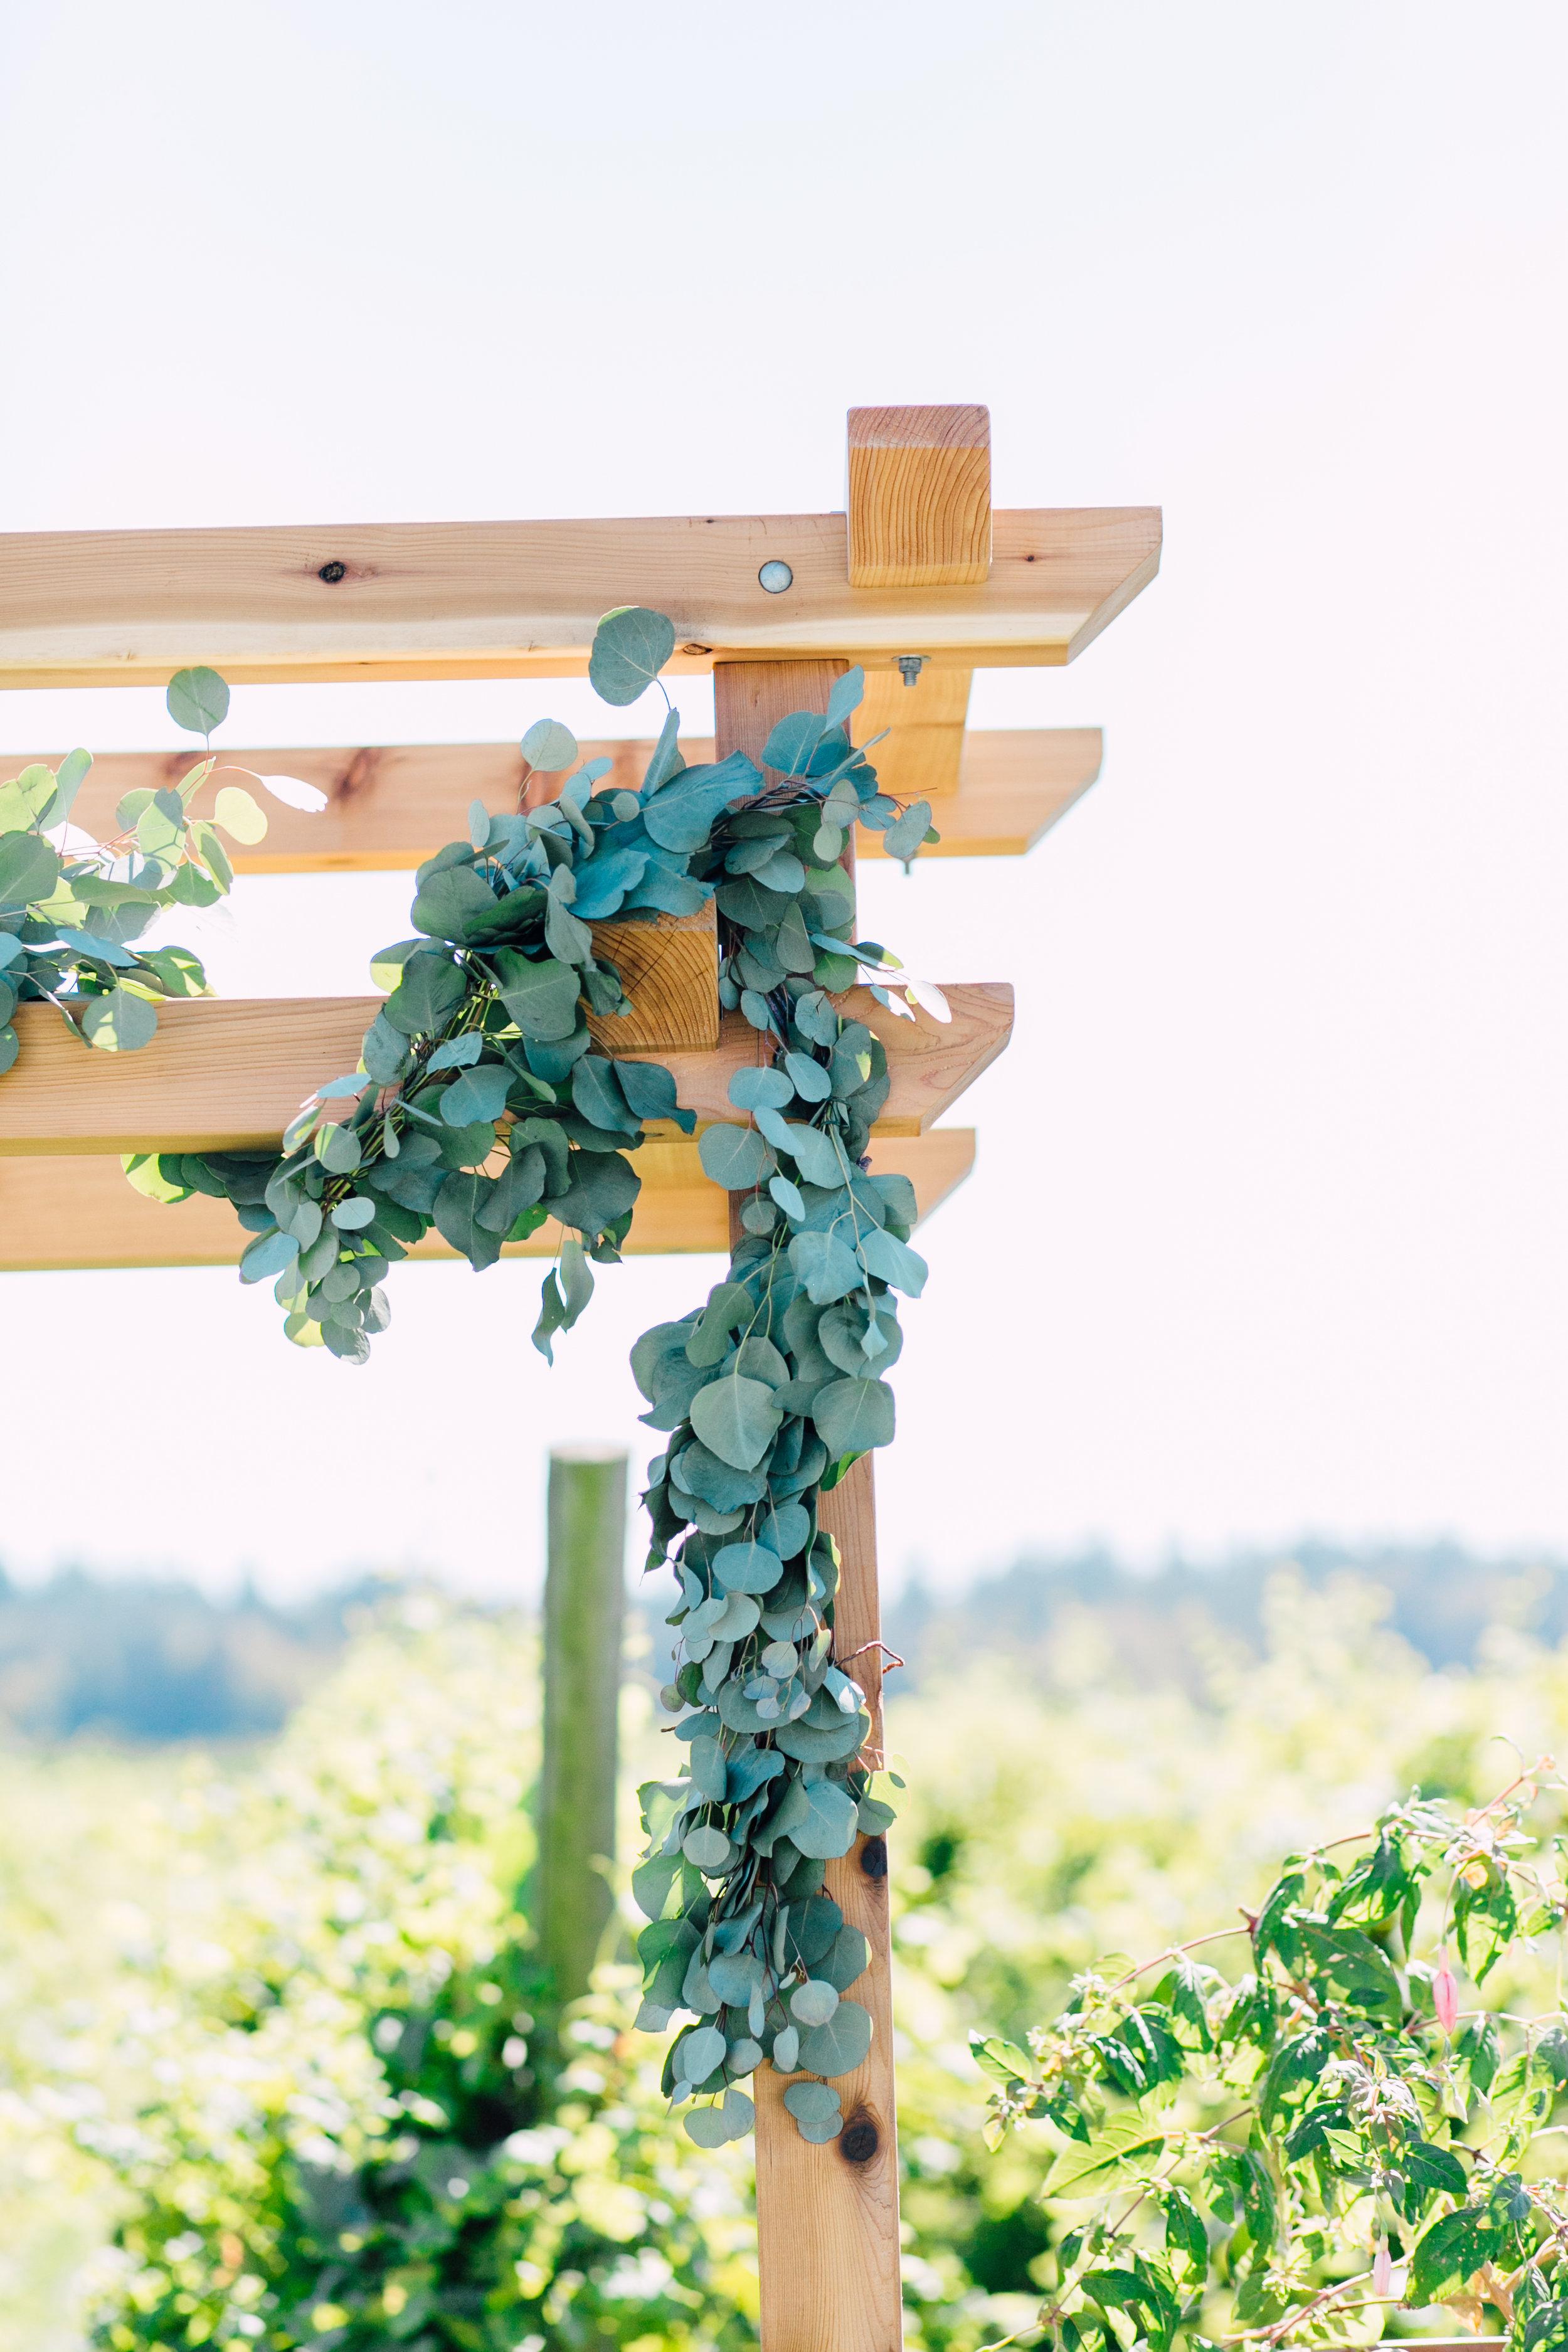 samson-winery-wedding-katheryn-moran-jillmike-359.jpg